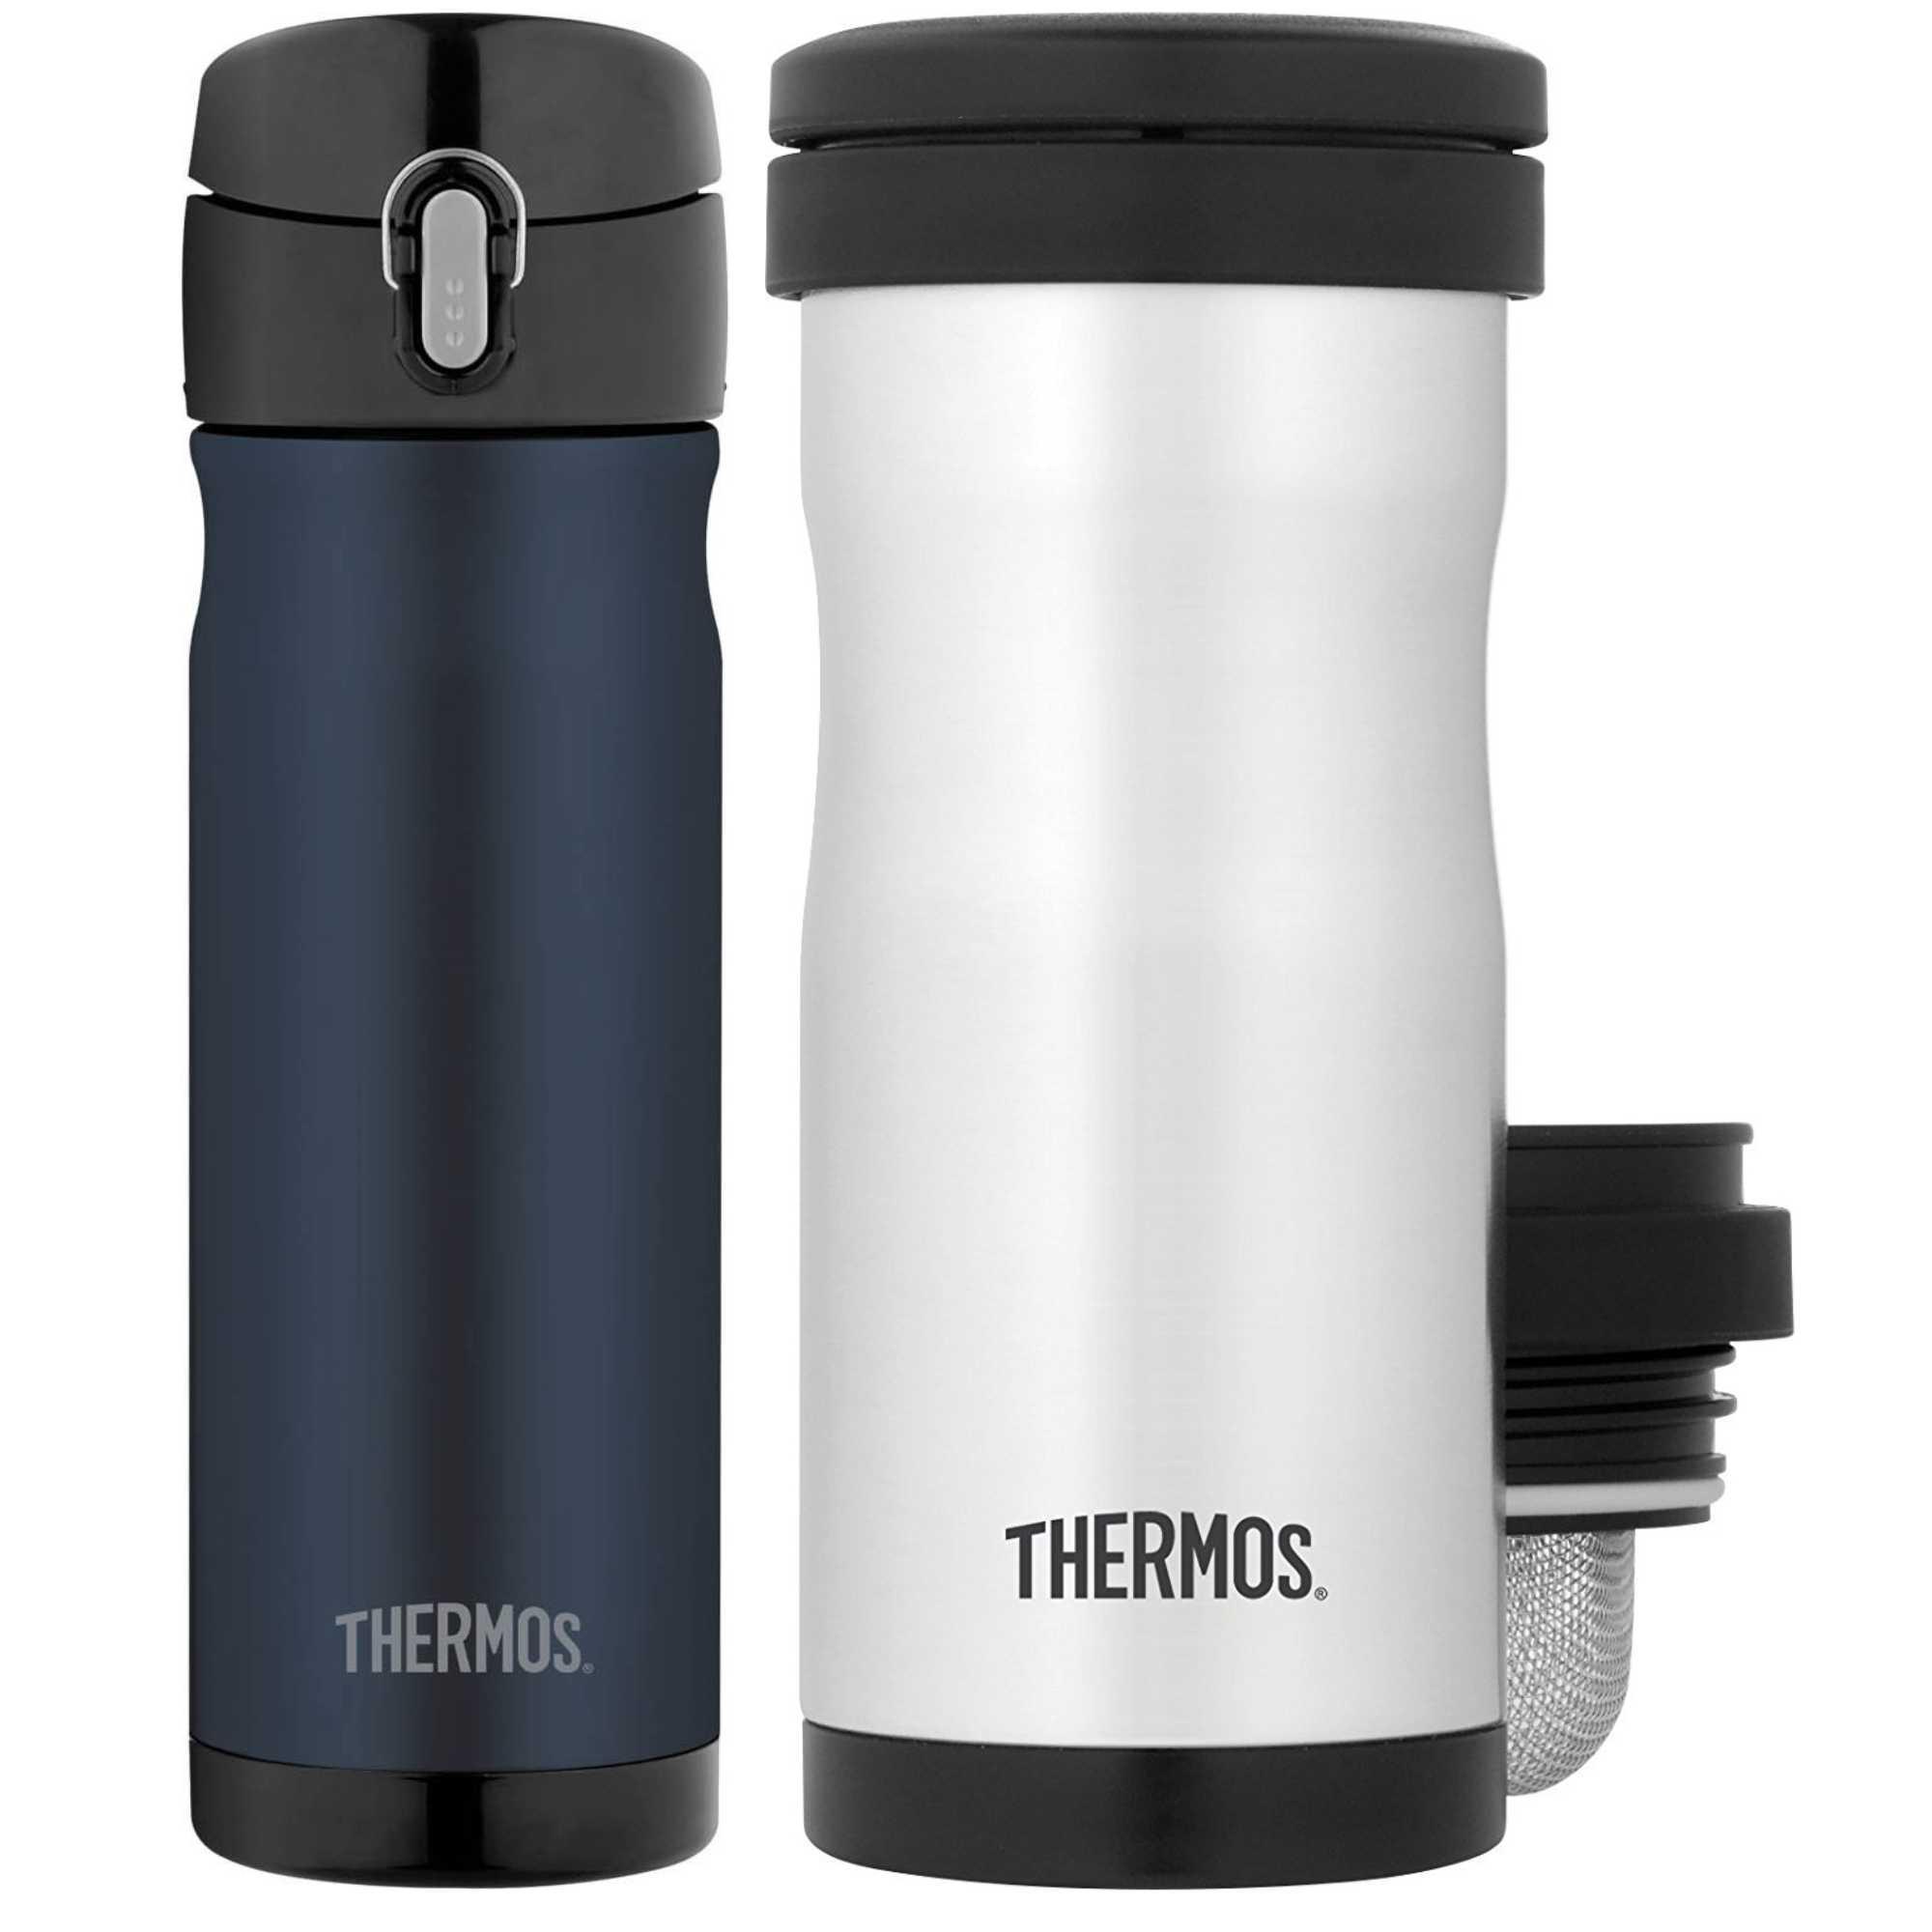 Thermos Vacuum Insulated 16 oz Commuter Bottle & 12oz Tea...